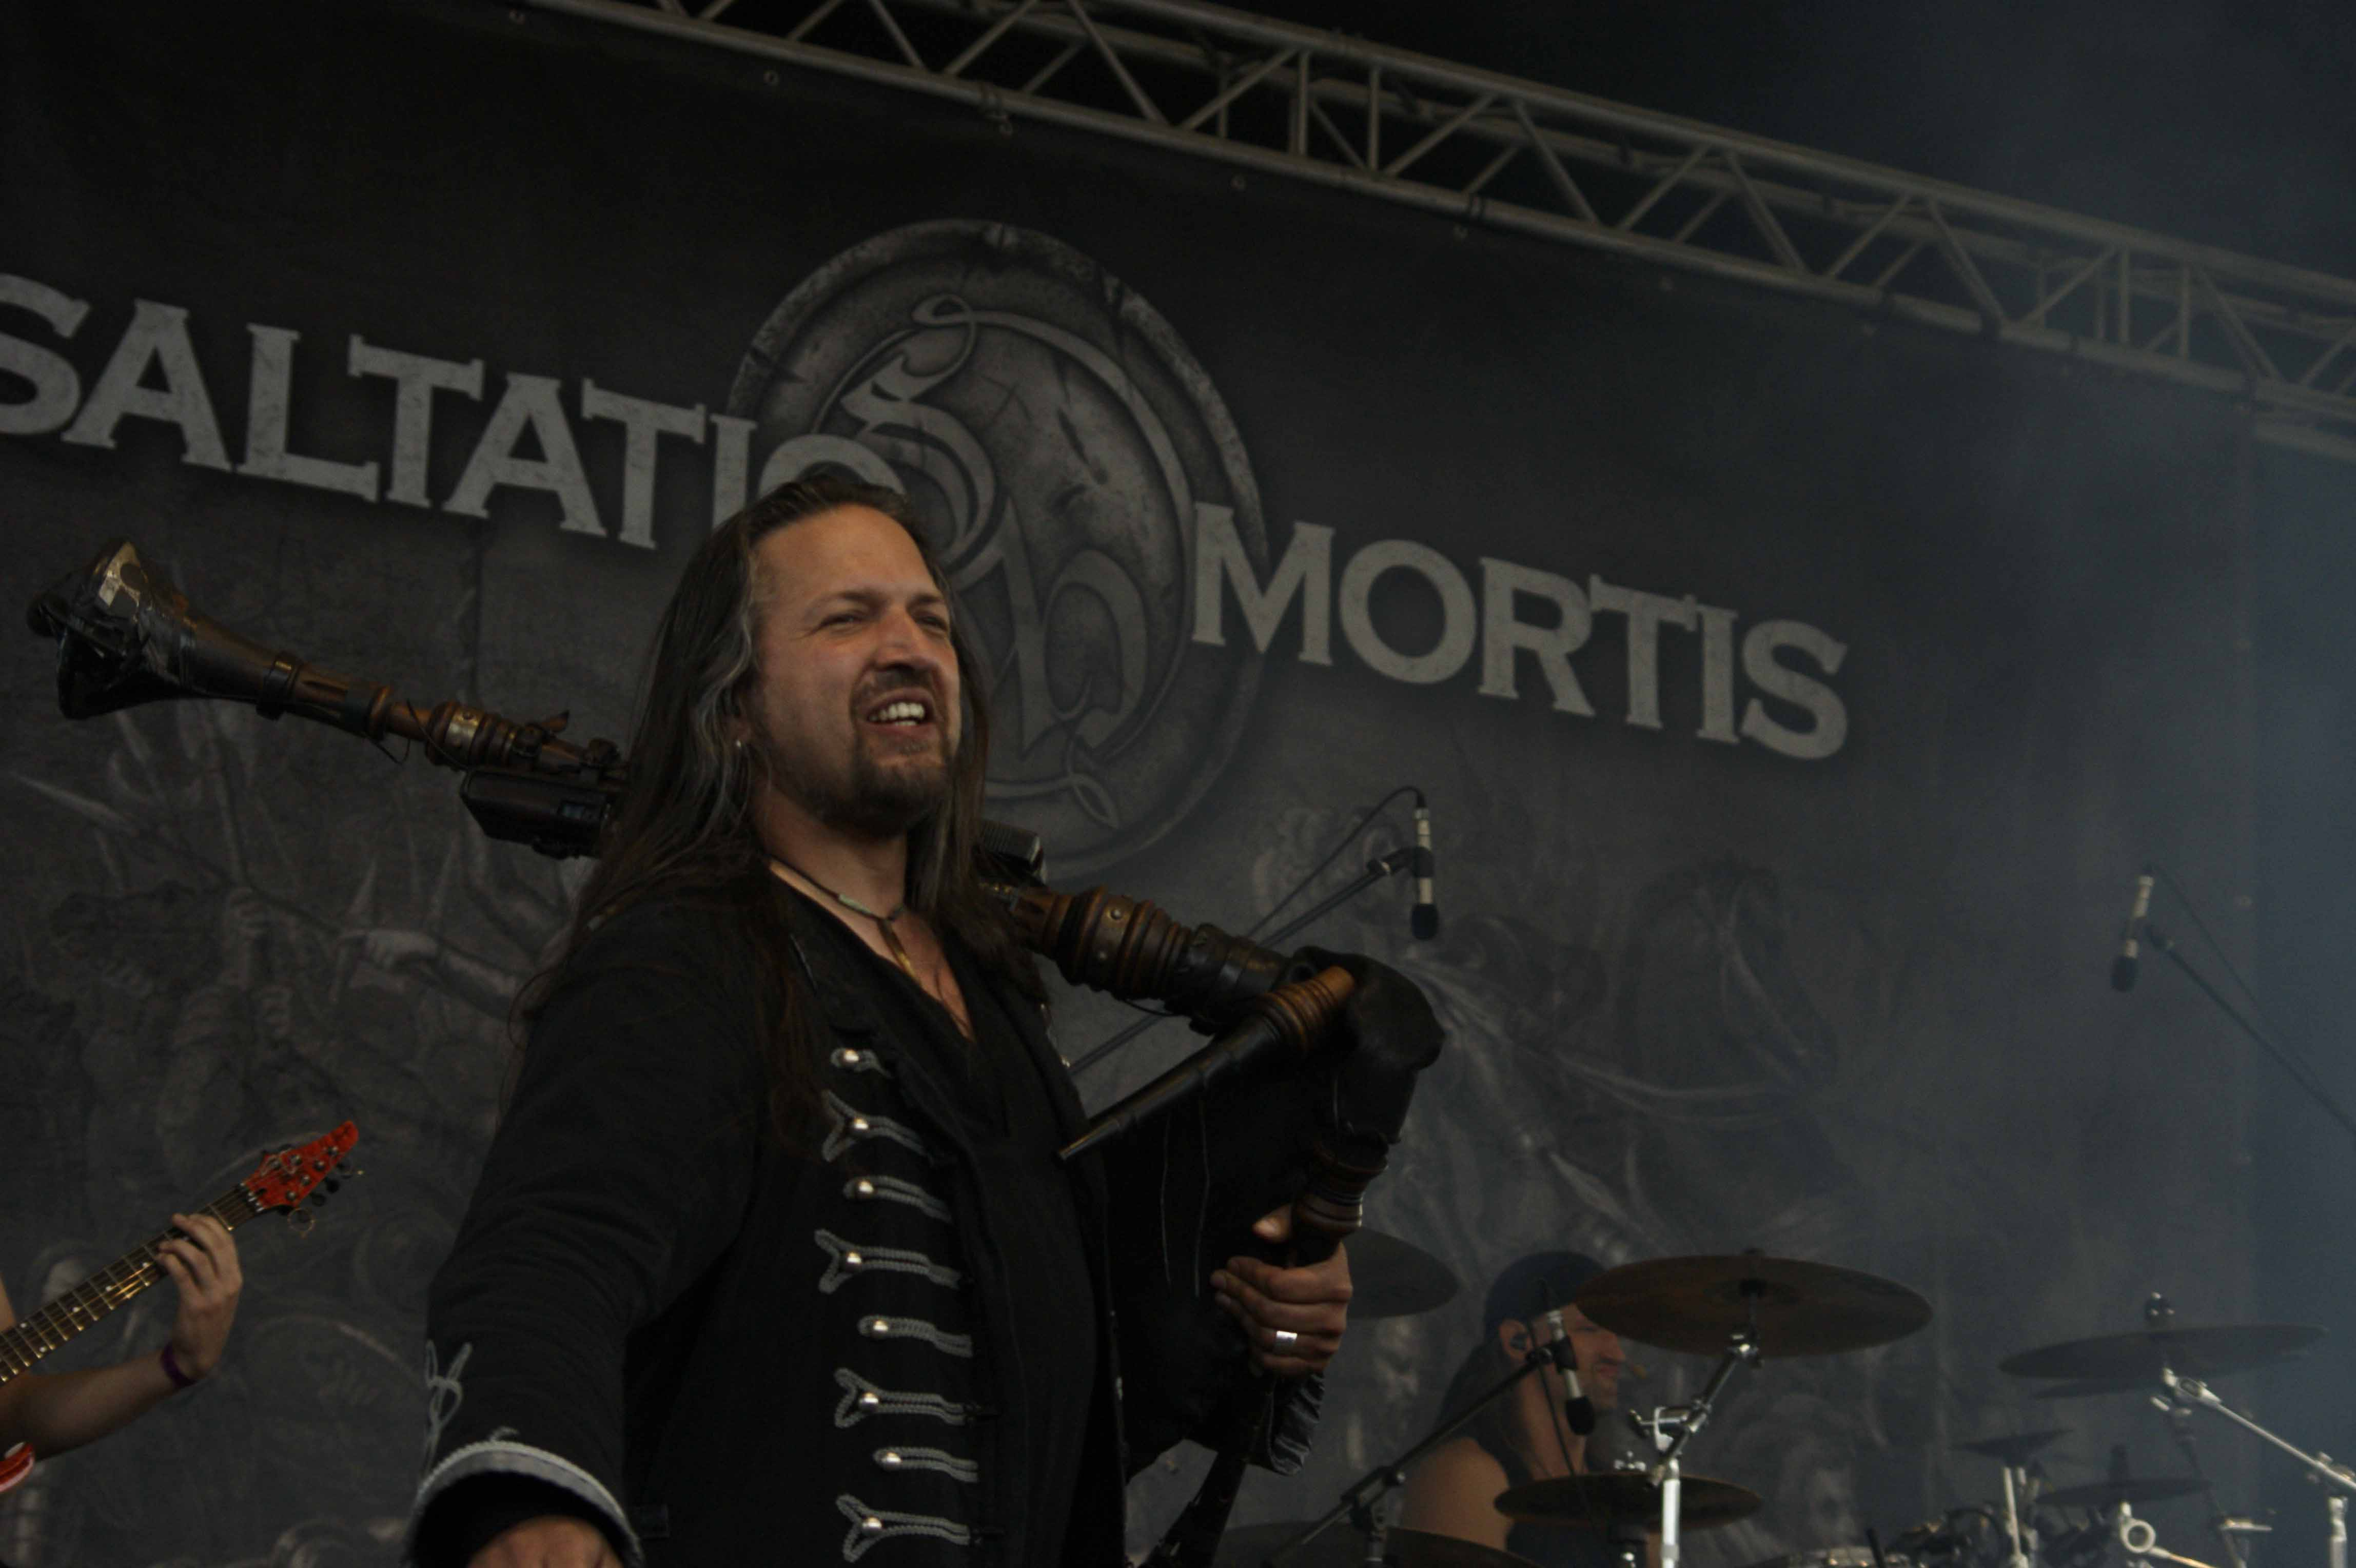 Saltatio Mortis - Blackfield Festival 2010